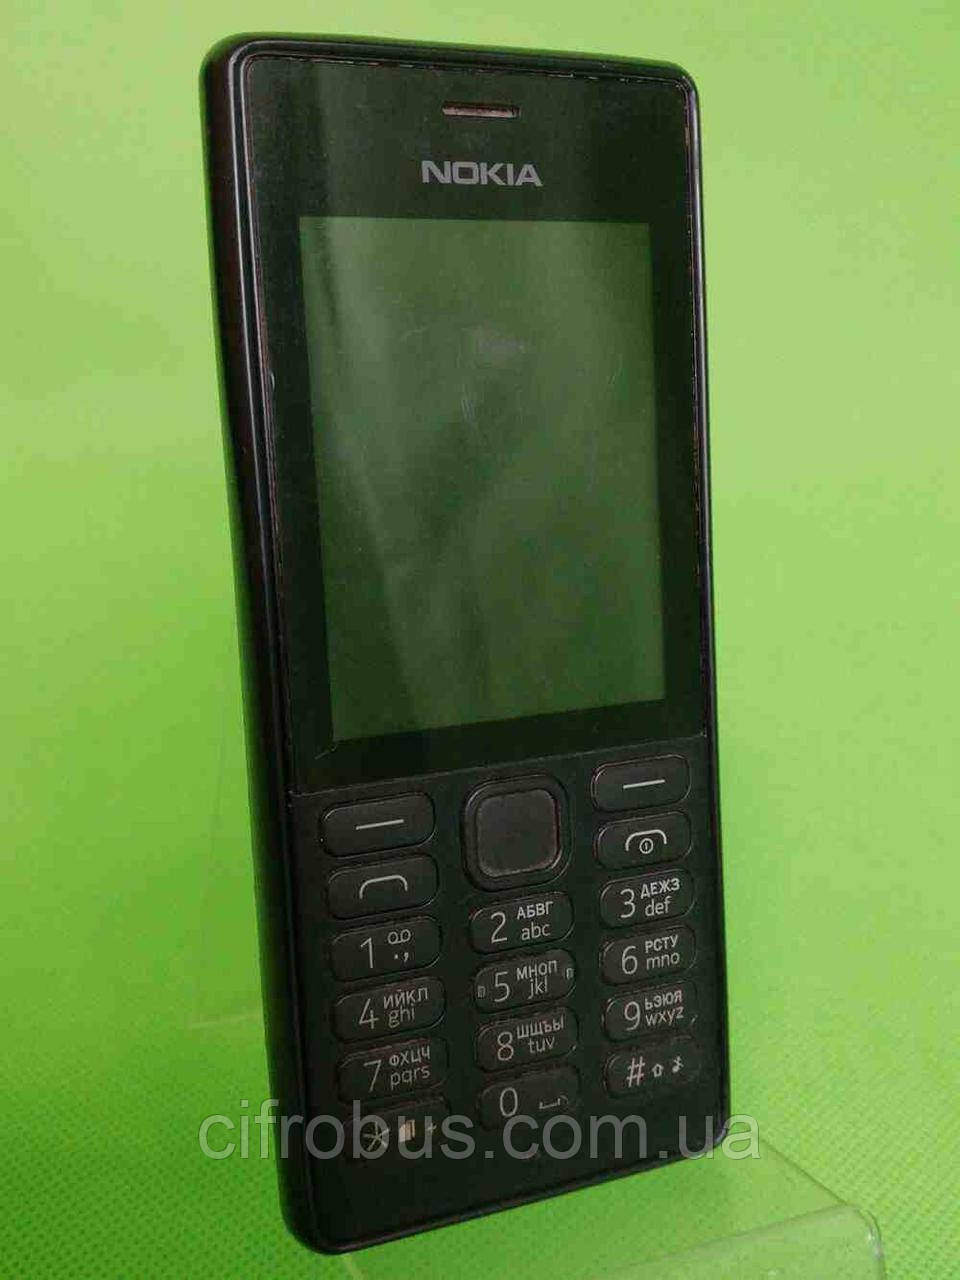 Б/У Nokia 150 Dual sim (RM-1190)